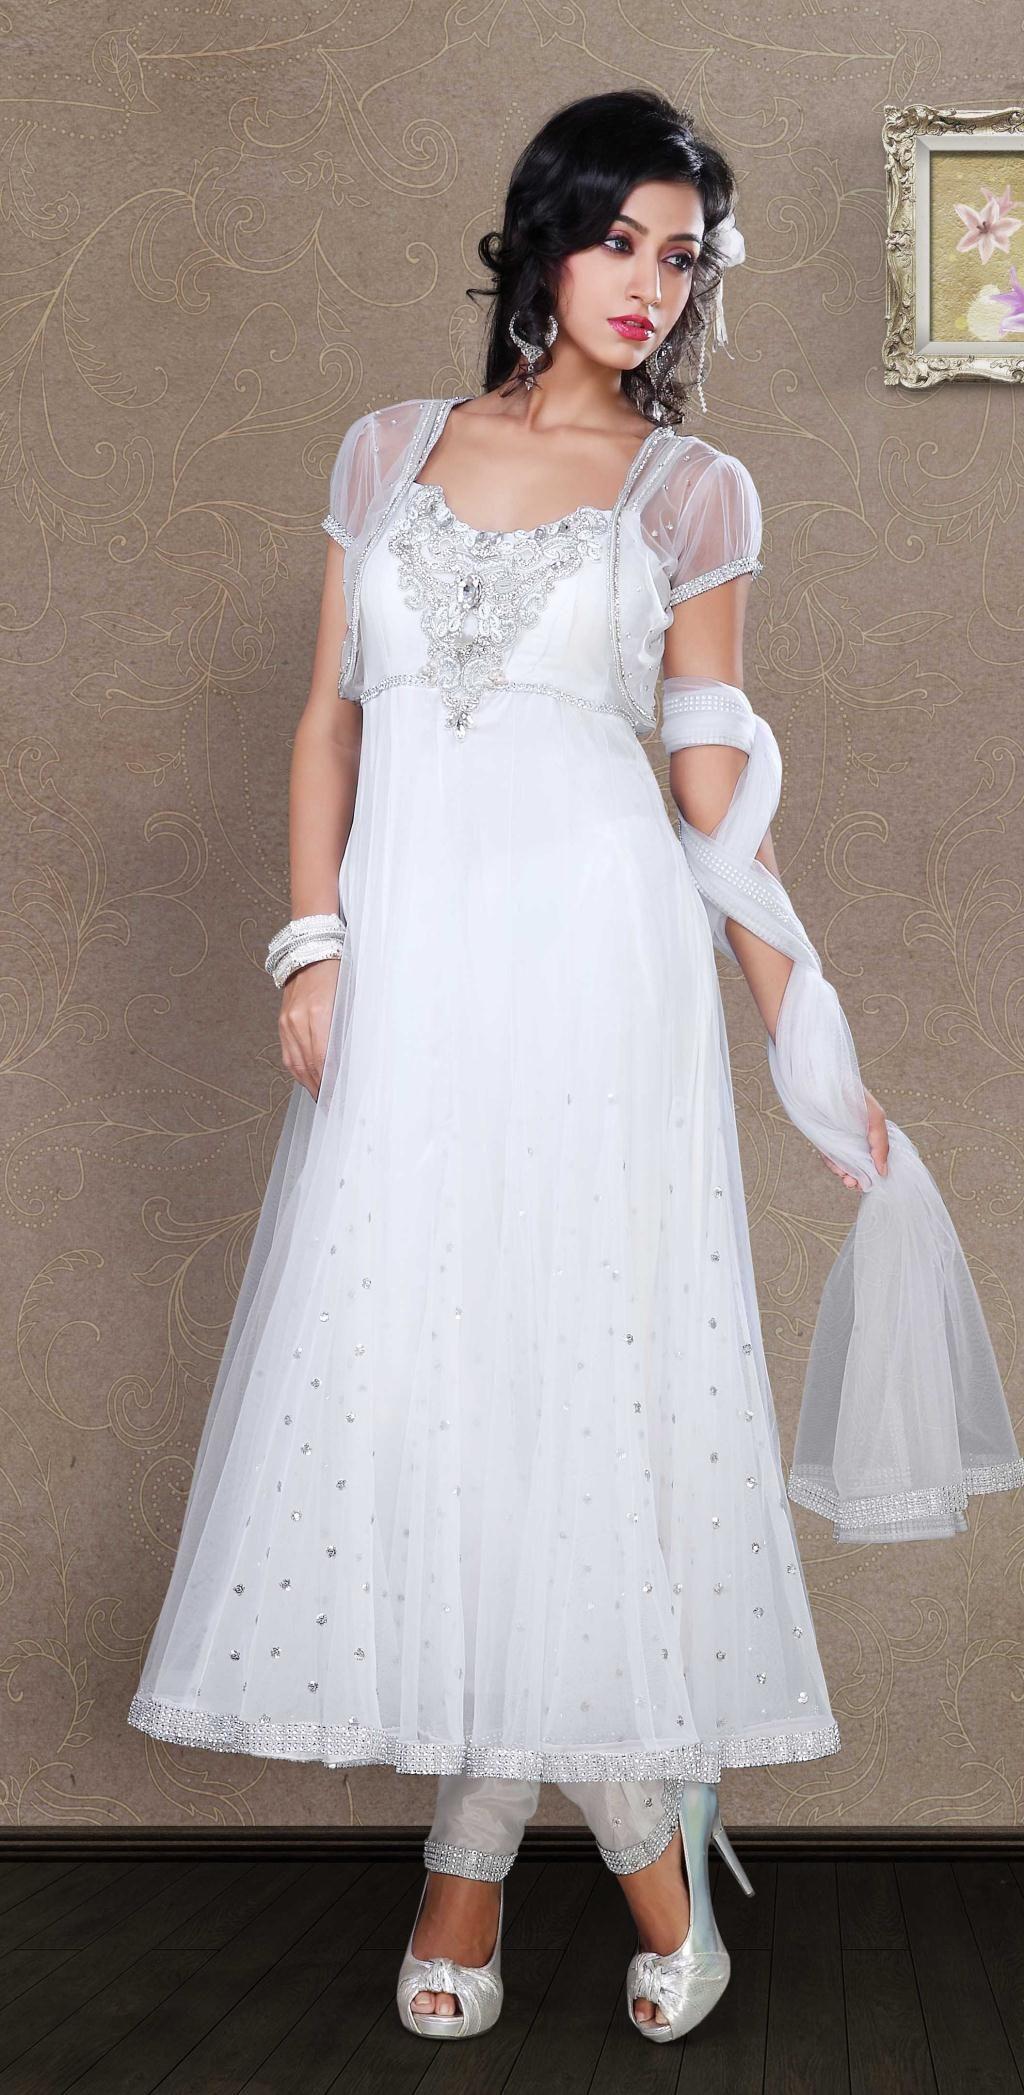 c0cb118a10 $158.34 White 3/4 Sleeve Net Long Anarkali Salwar Kameez 19834 ...